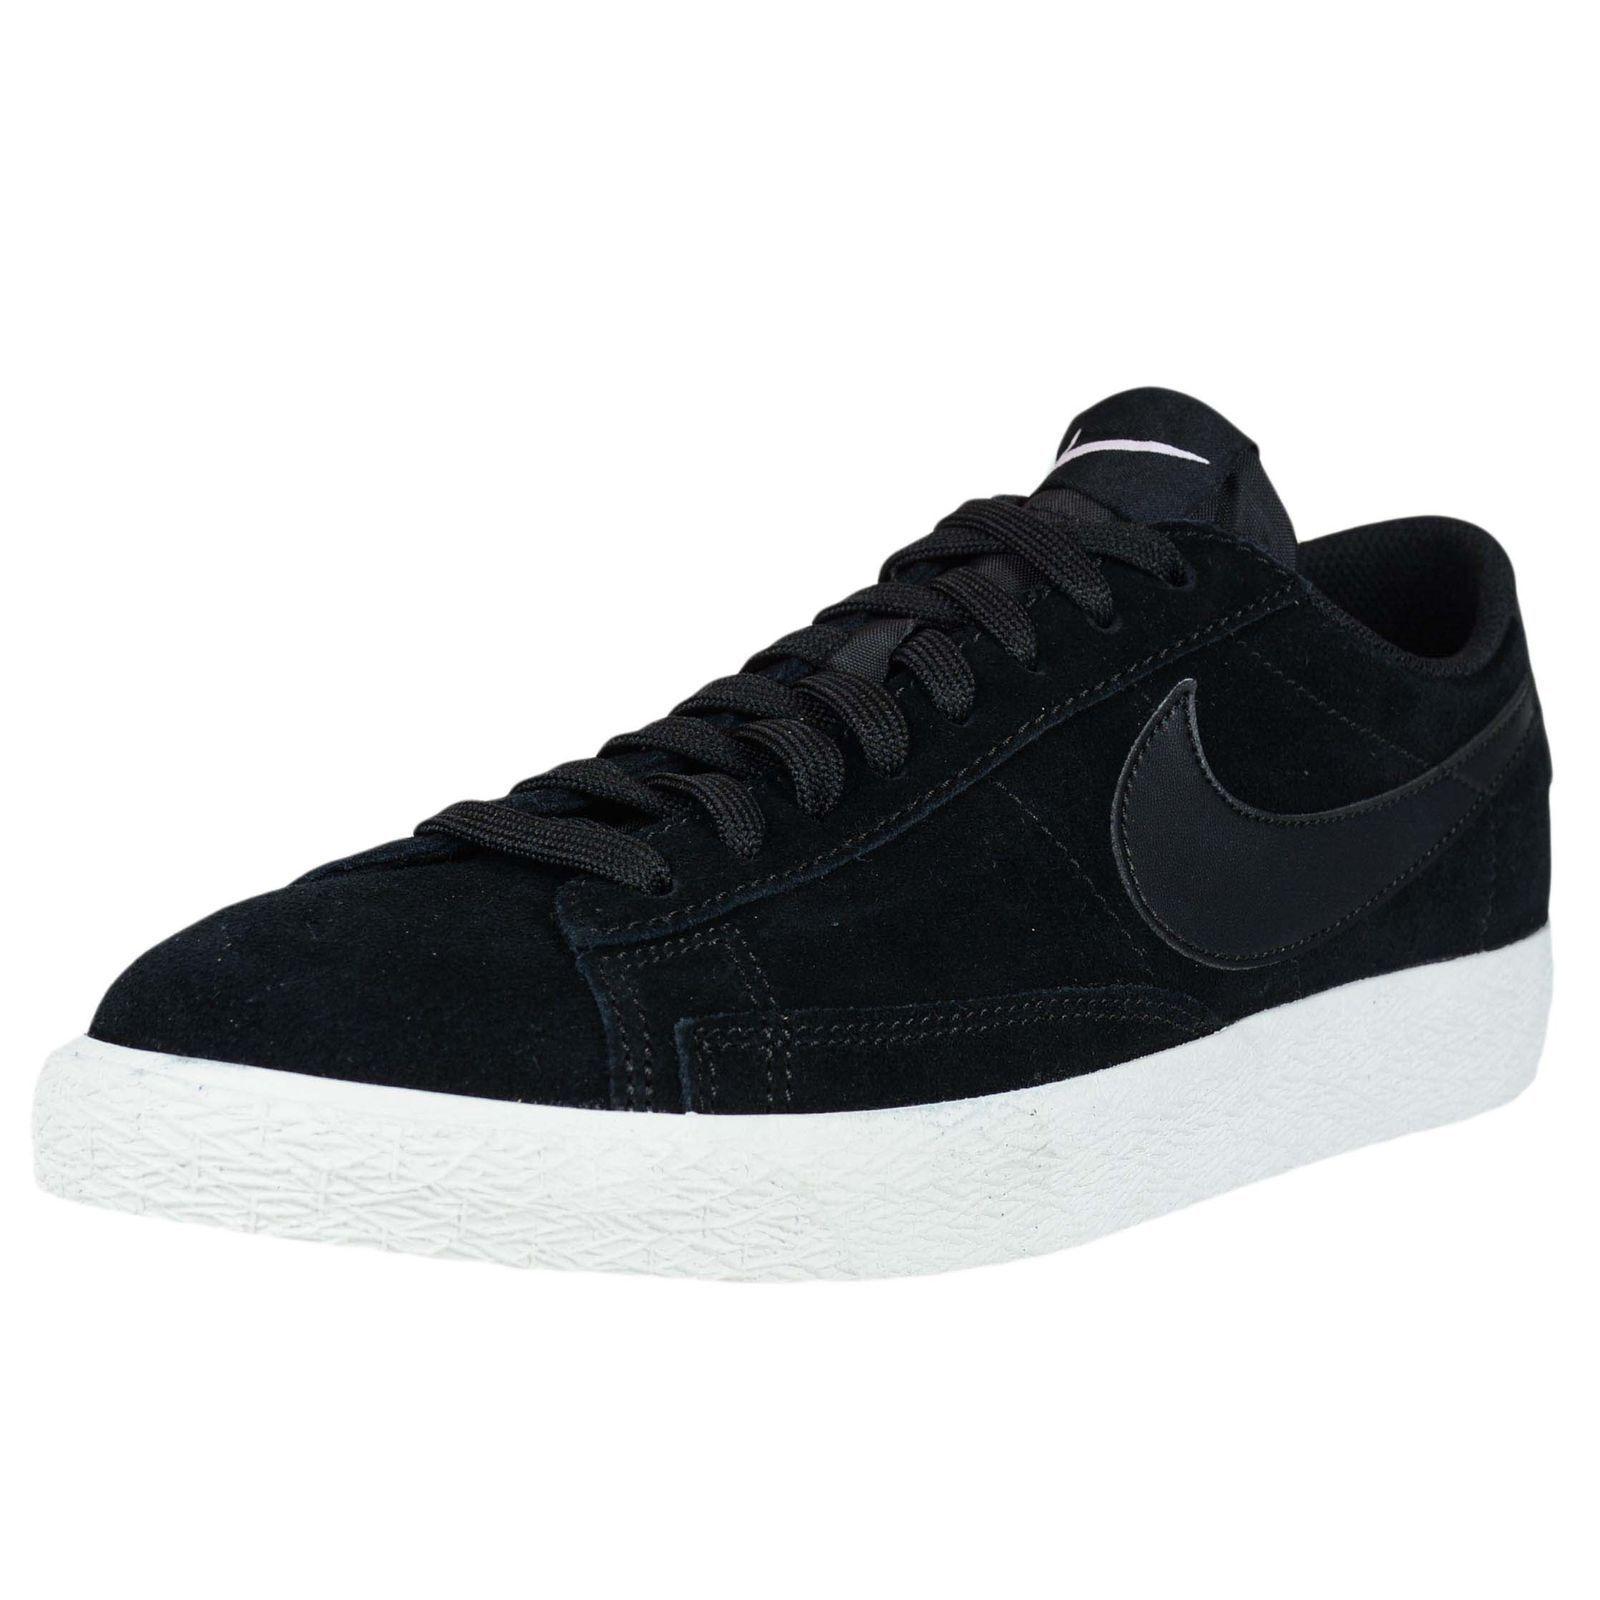 New Nike Basketball Blazer Low Men's Retro Basketball Nike Shoes Black 371760 024 056975